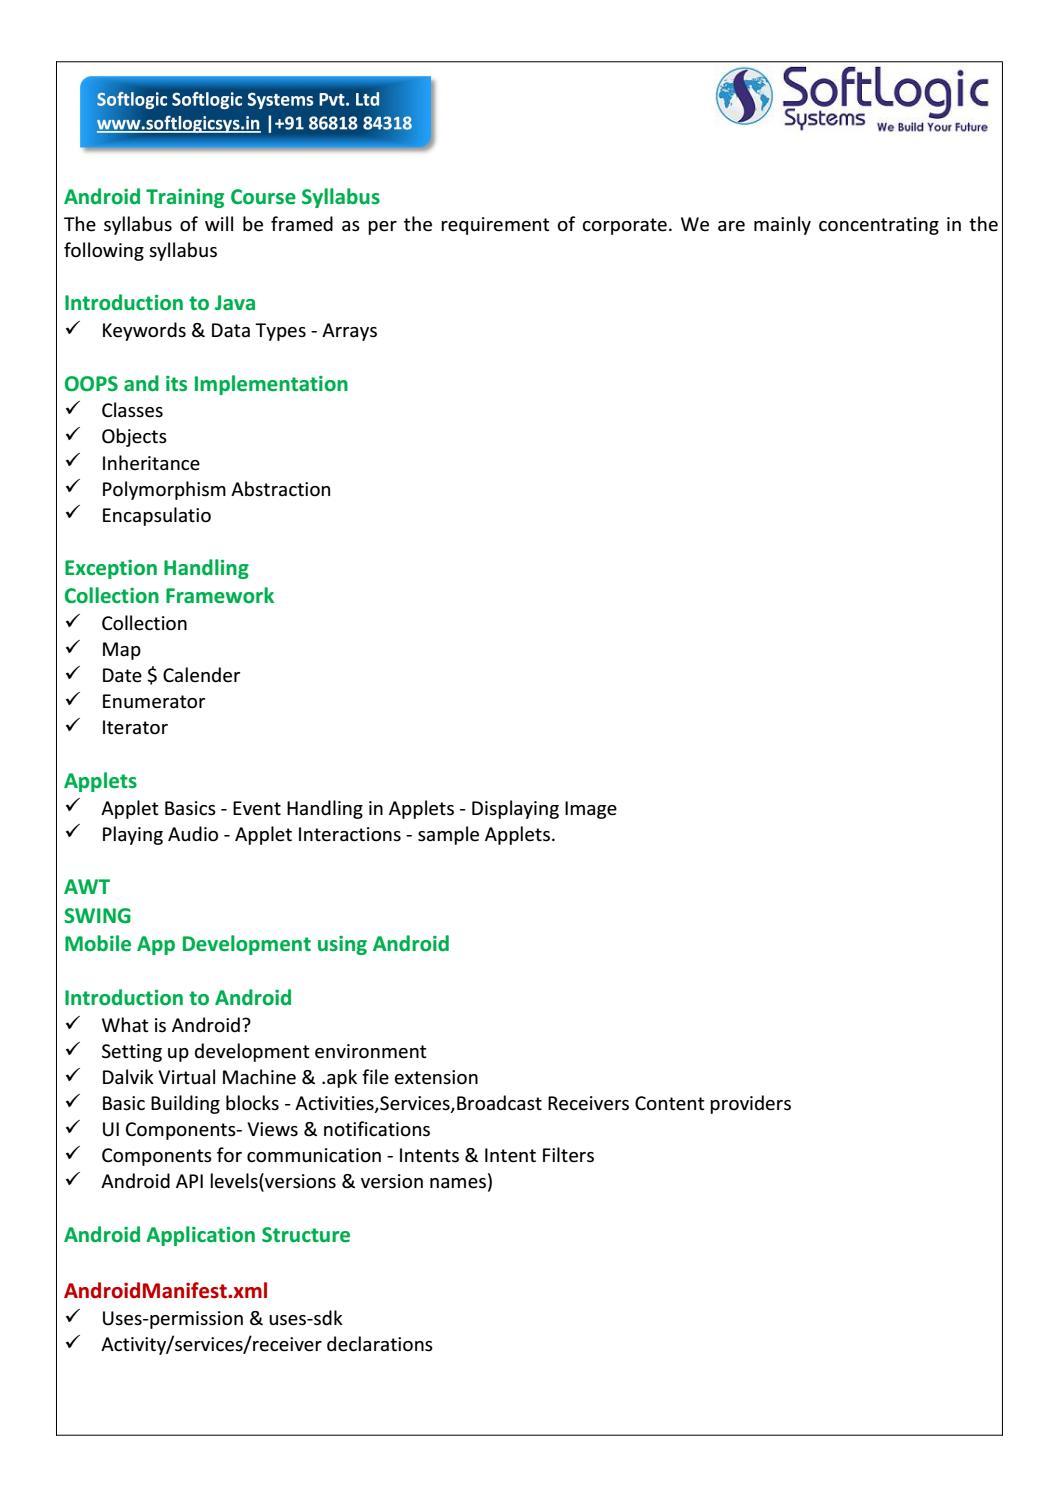 Softlogic - Android Training Course Syllabus by Softlogic